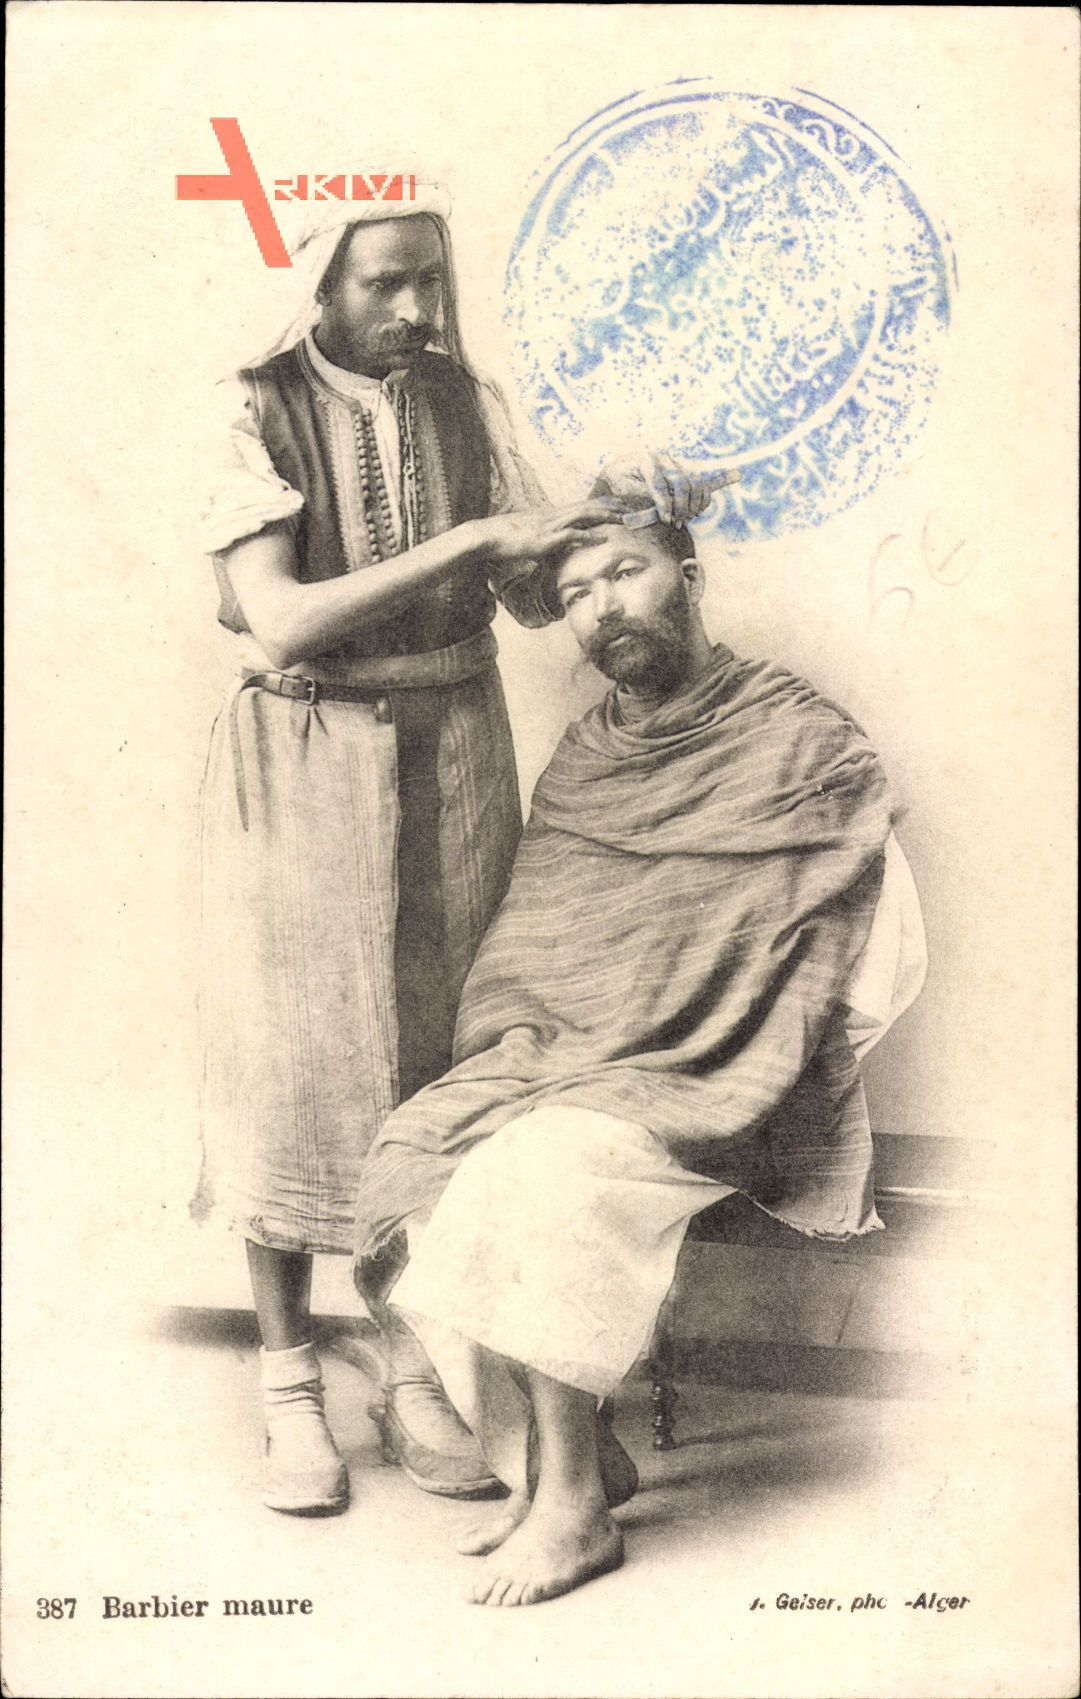 Barbier maure, Maurischer Barbier, Friseur bei der Arbeit